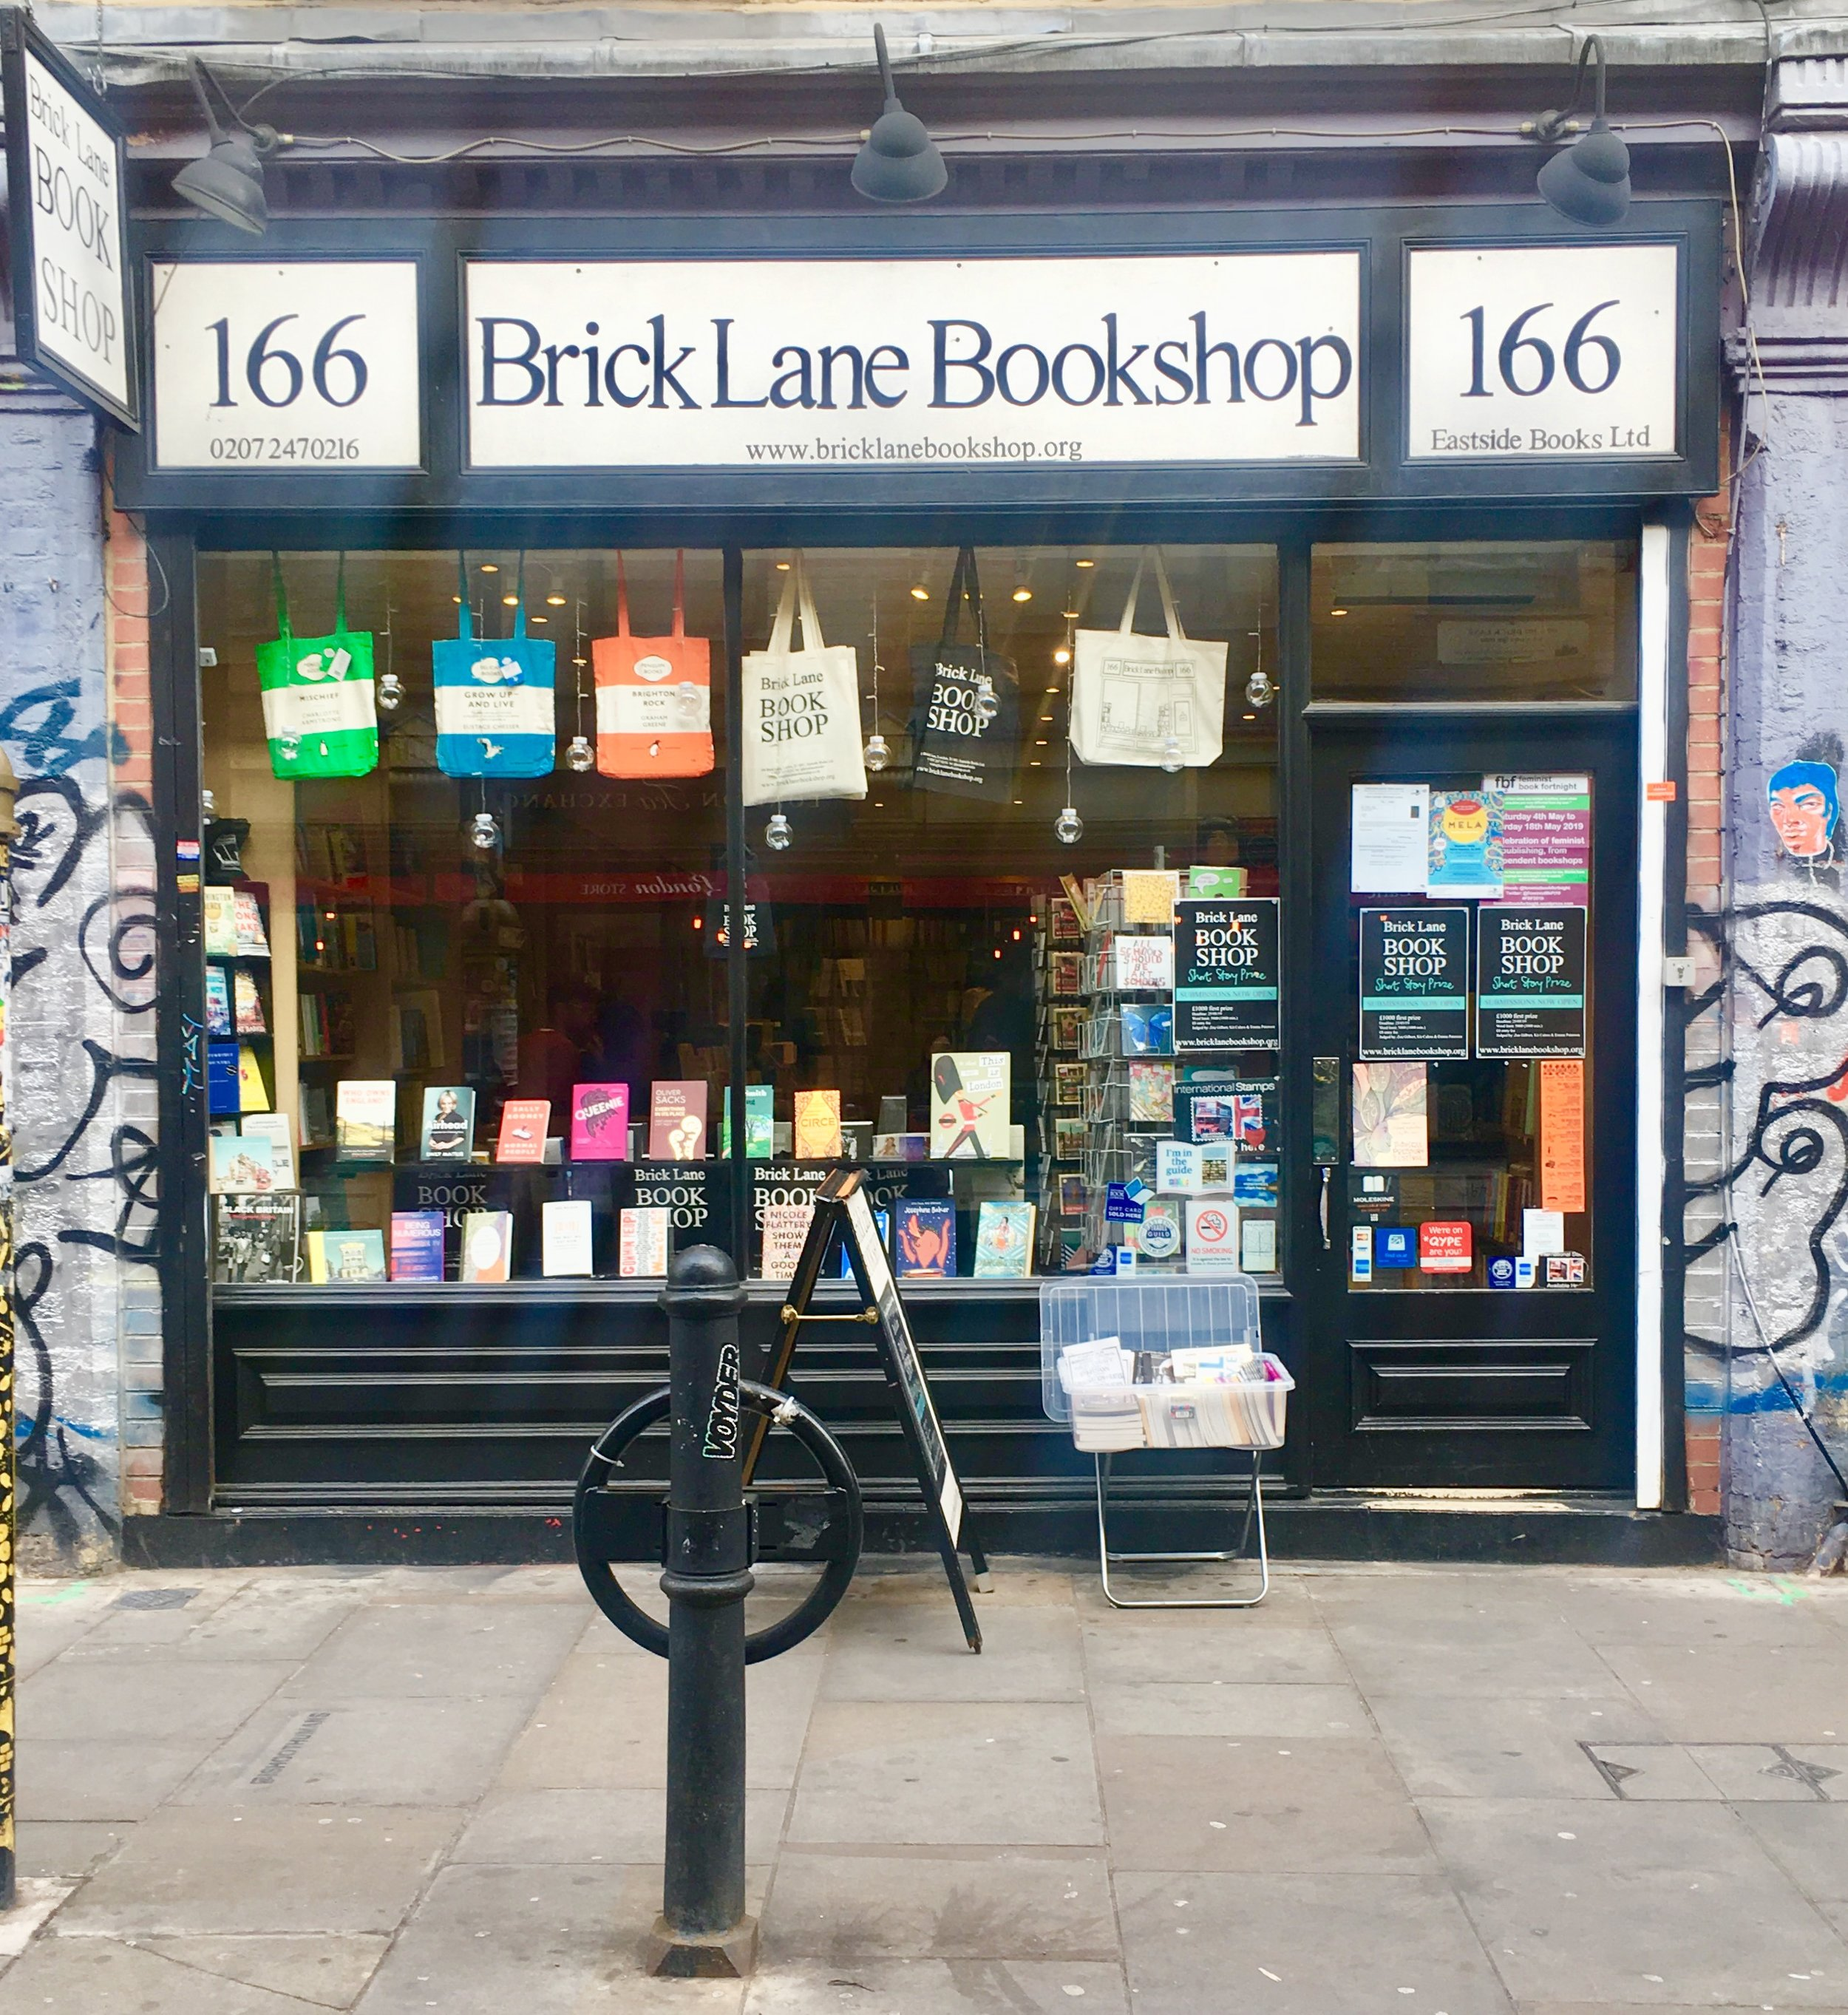 Brick Lane Bookshop  provides Shoreditch the local neighborhood bookshop experience for over thirty years. 166 Brick Lane, Shoreditch, London, UK.